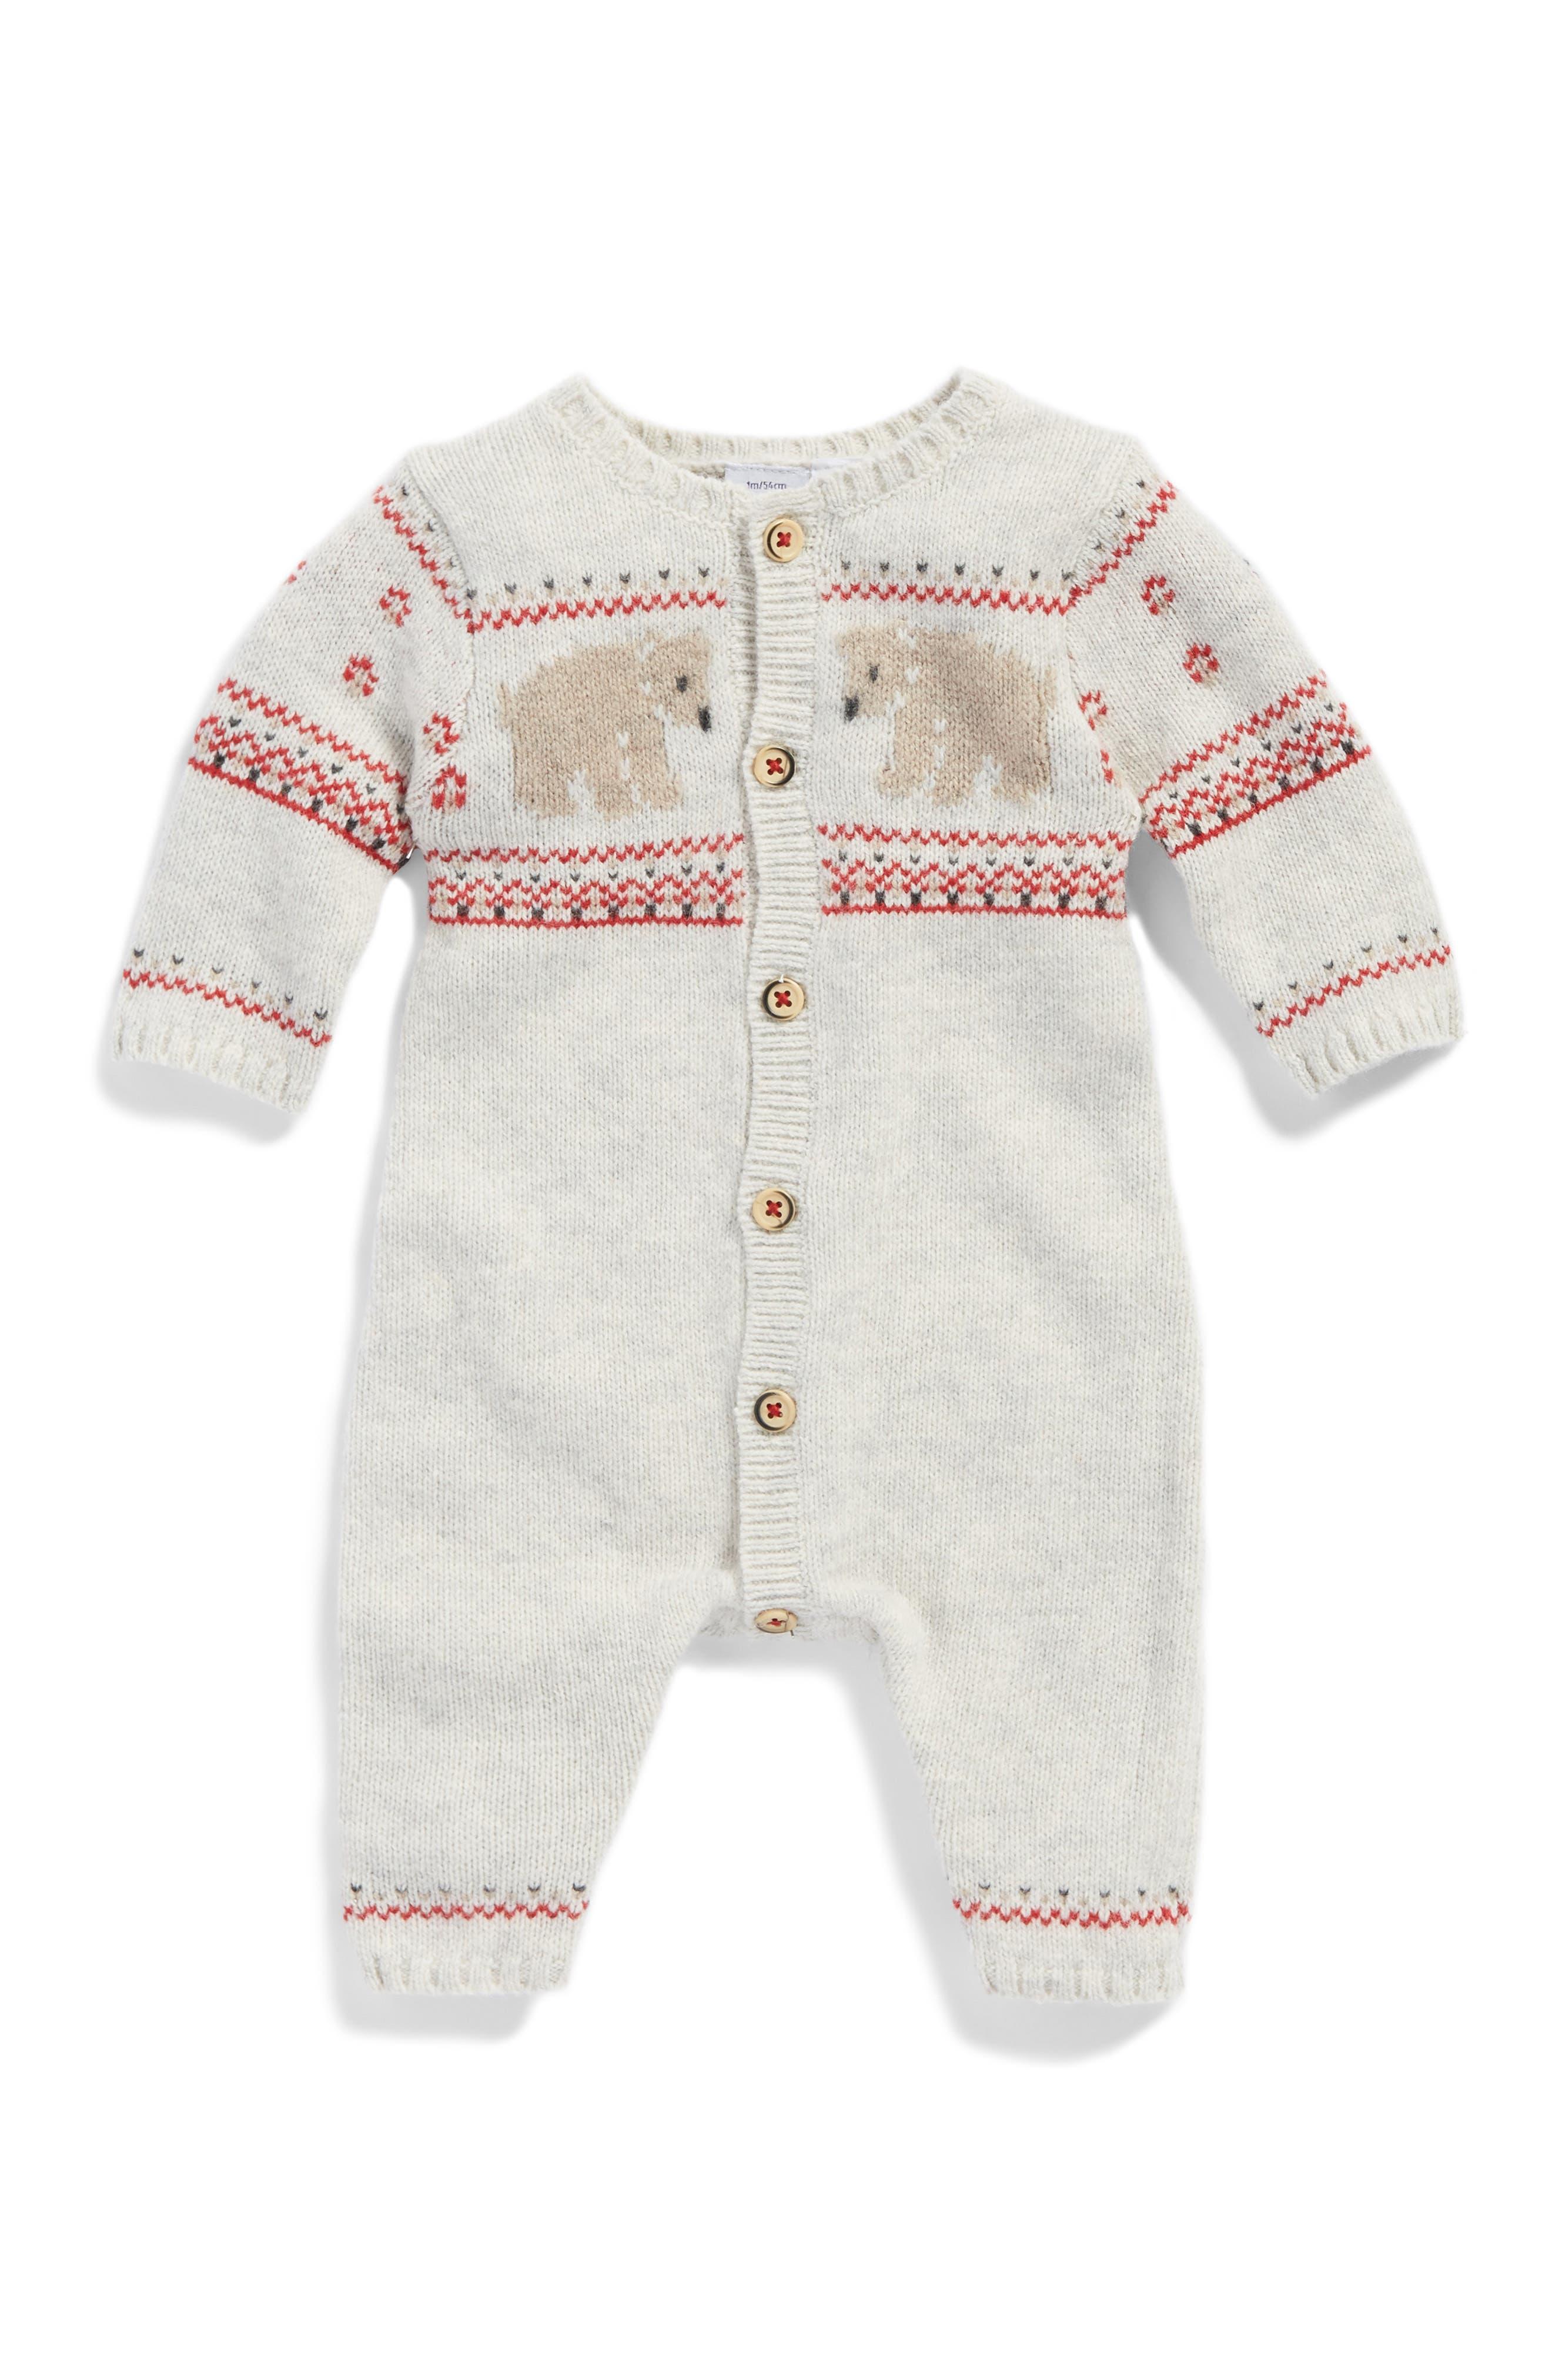 Petit Bateau Jacquard Knit Romper (Baby)